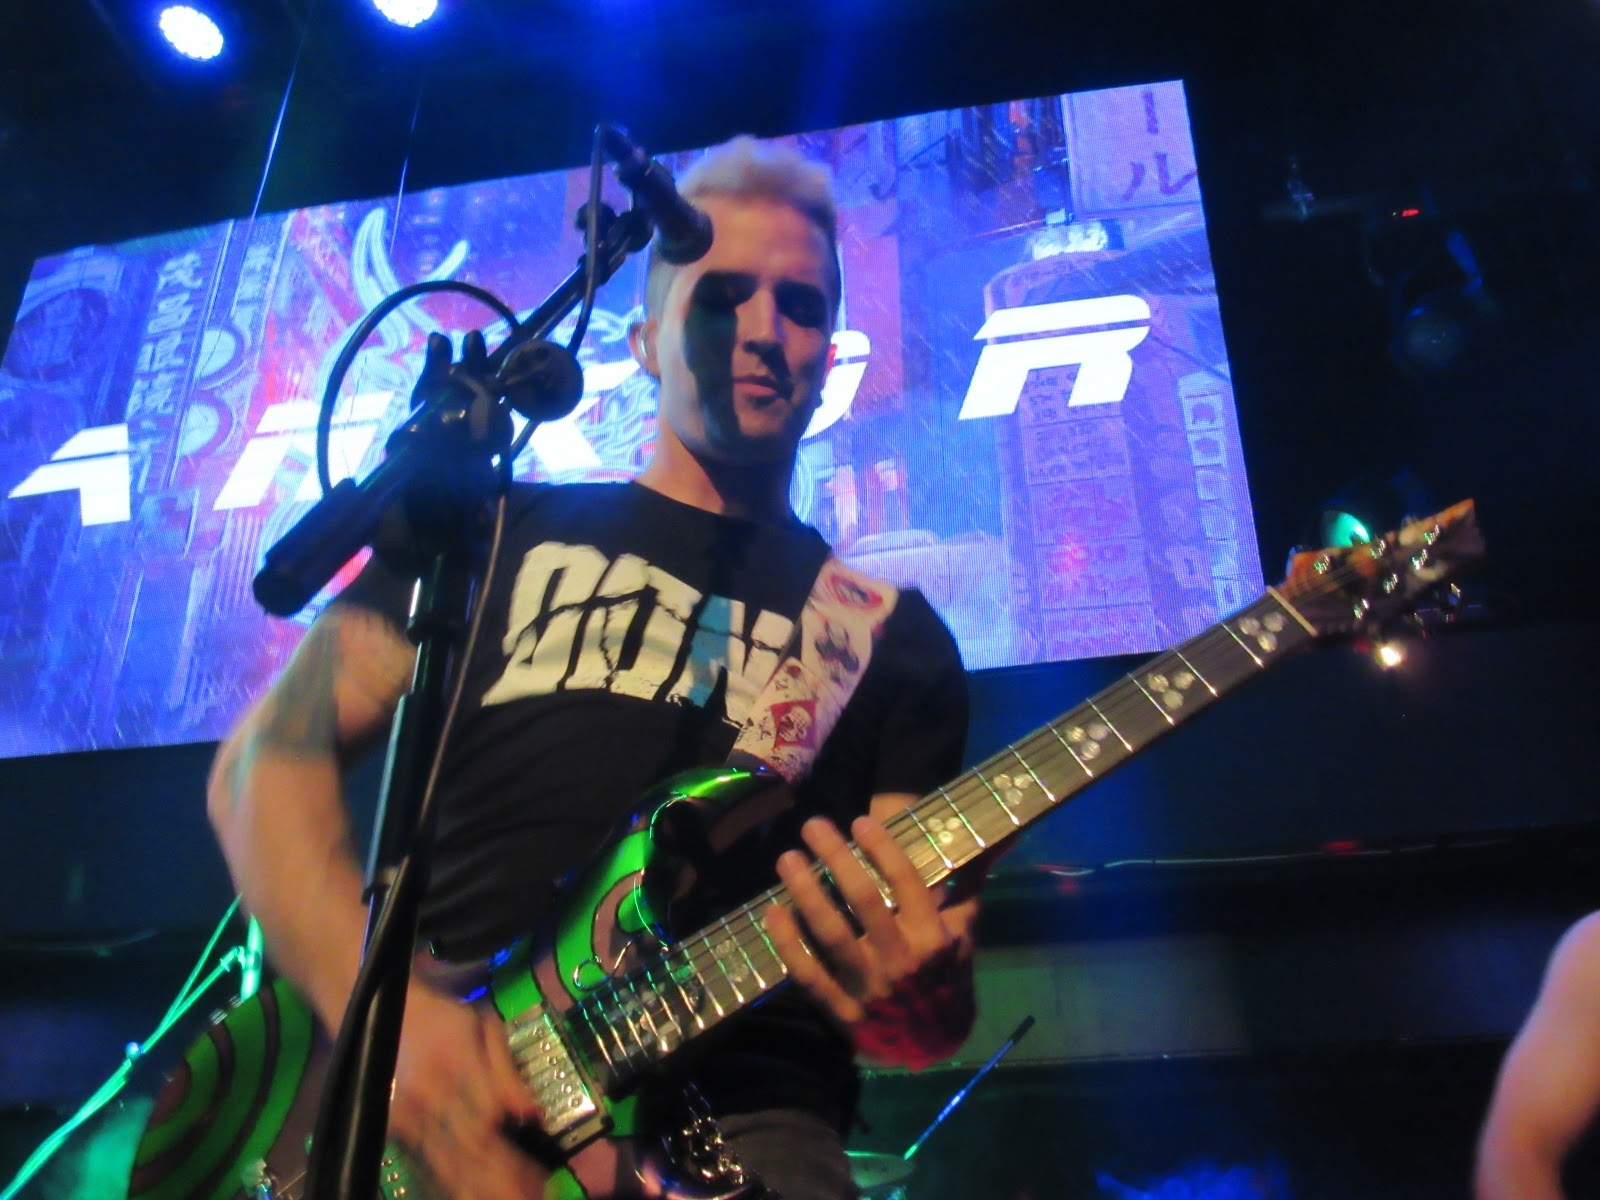 Ankor guitarrista